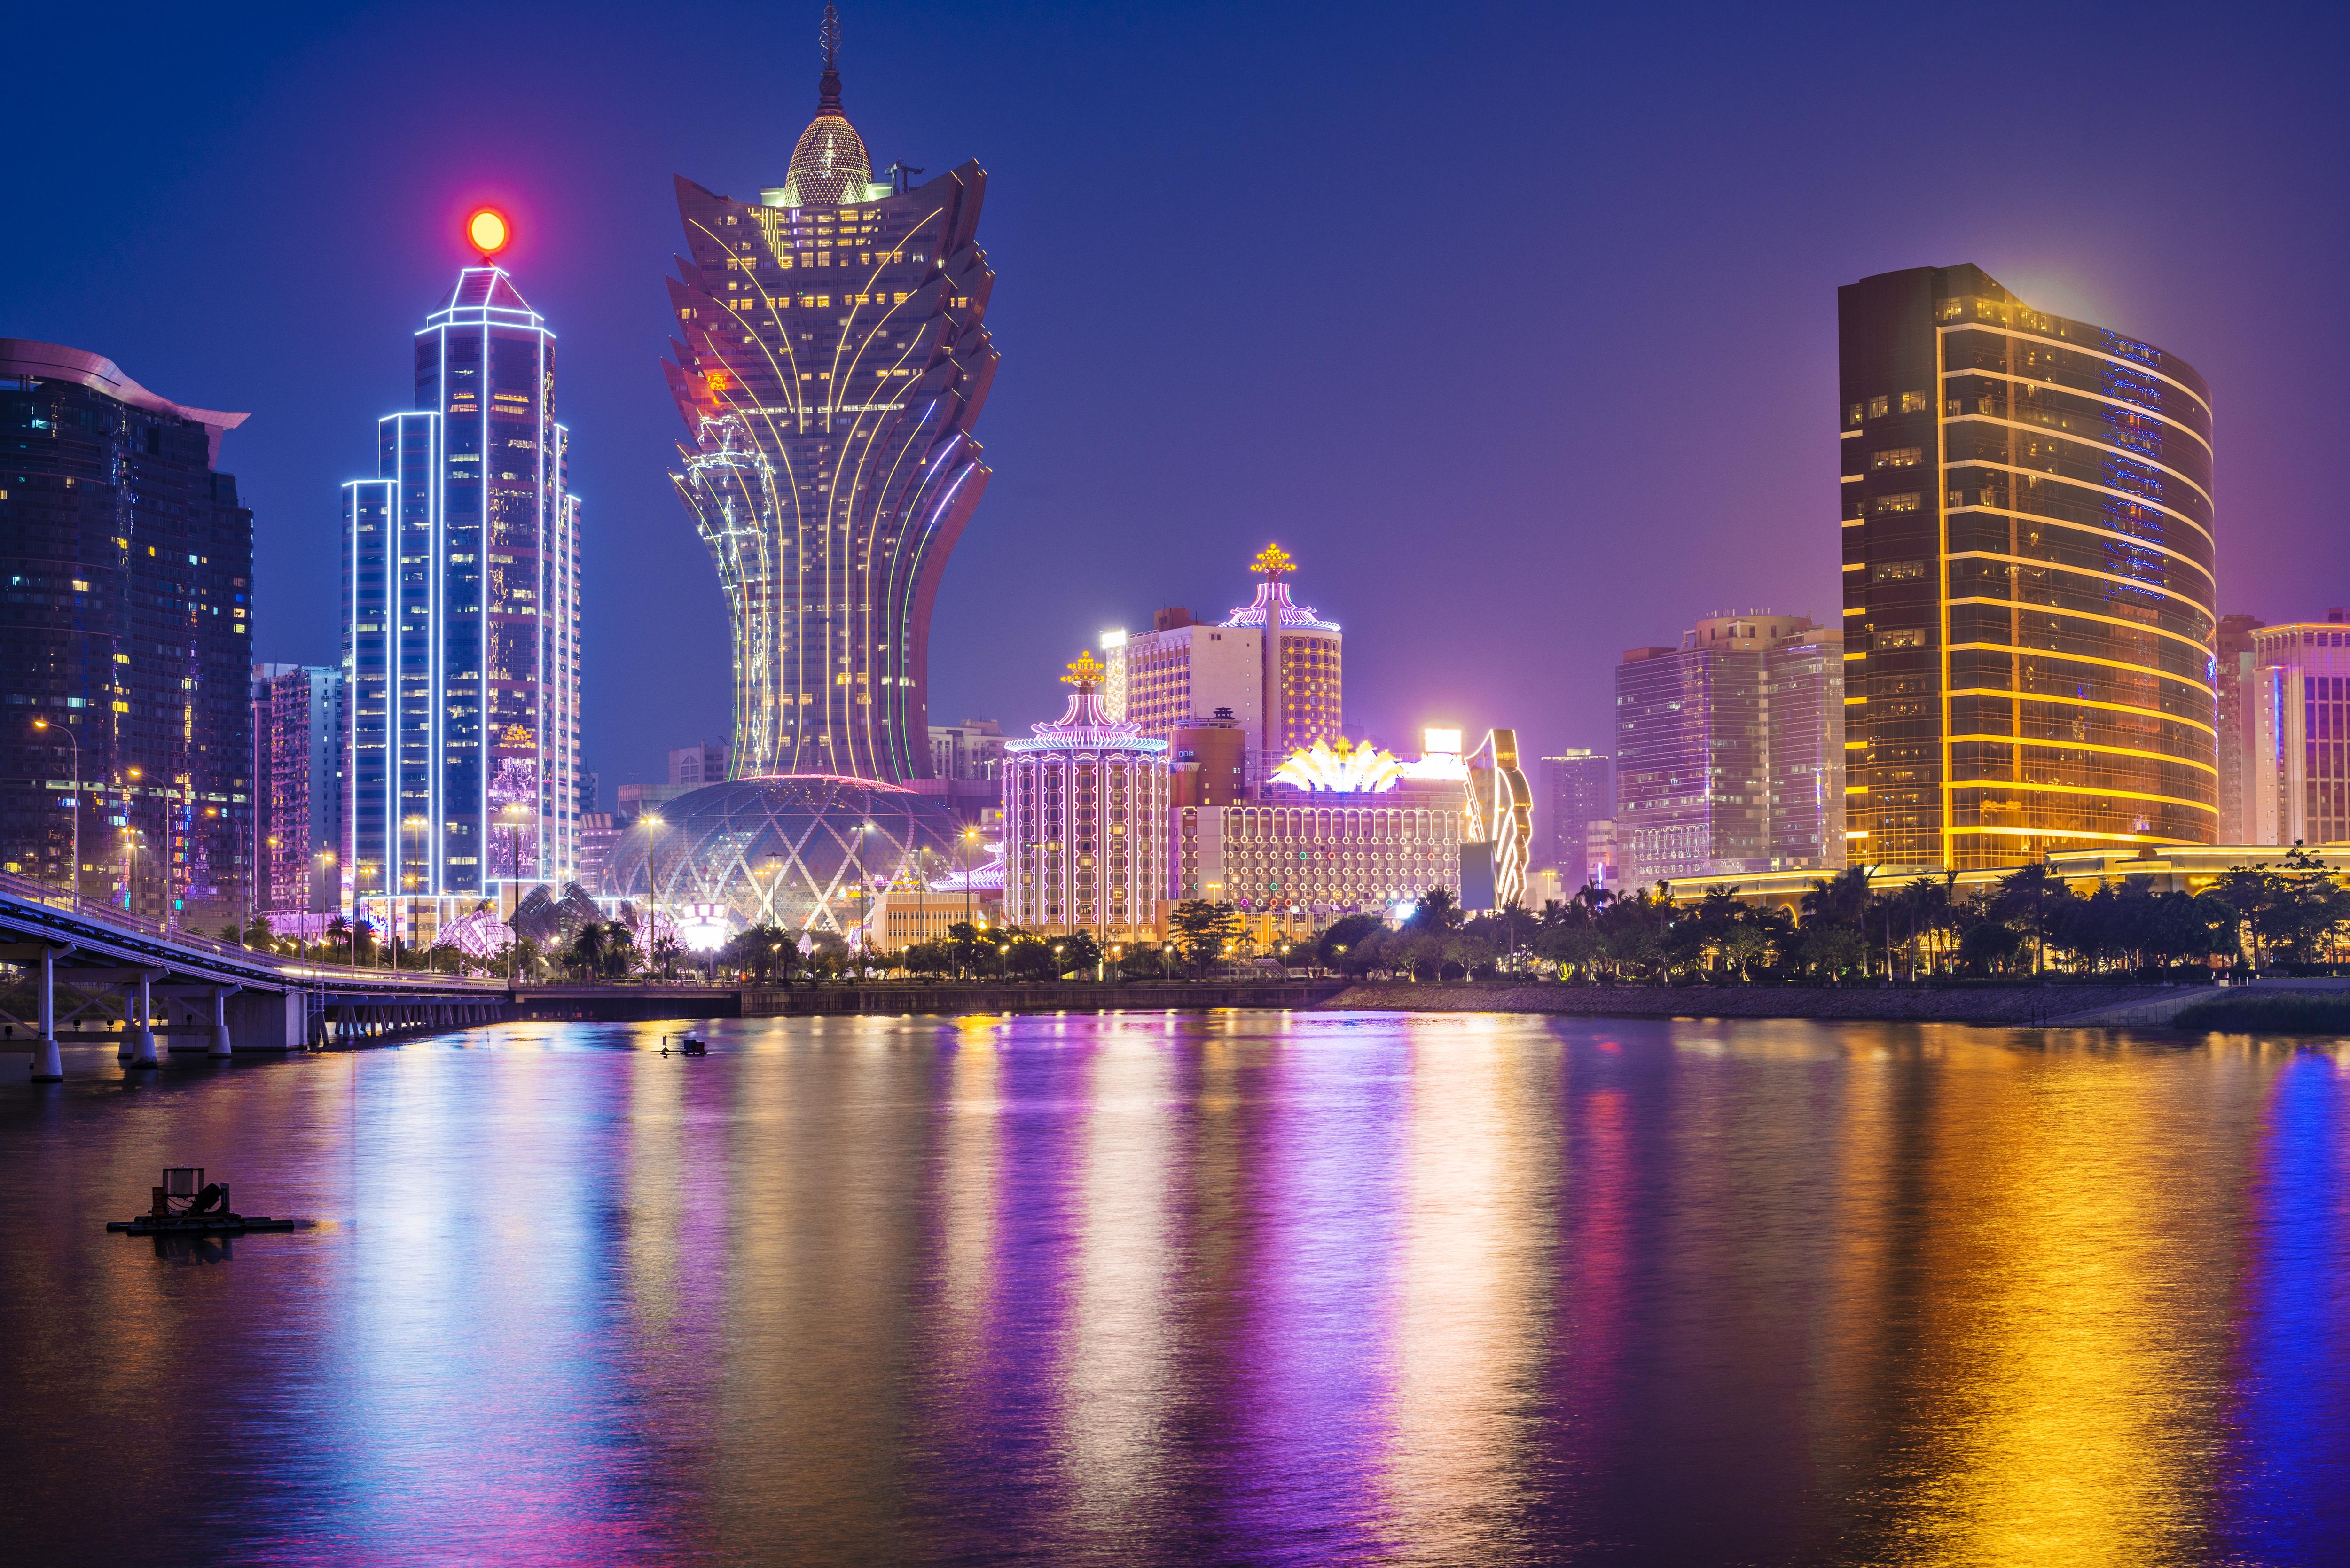 View of Macau's skyline at night.